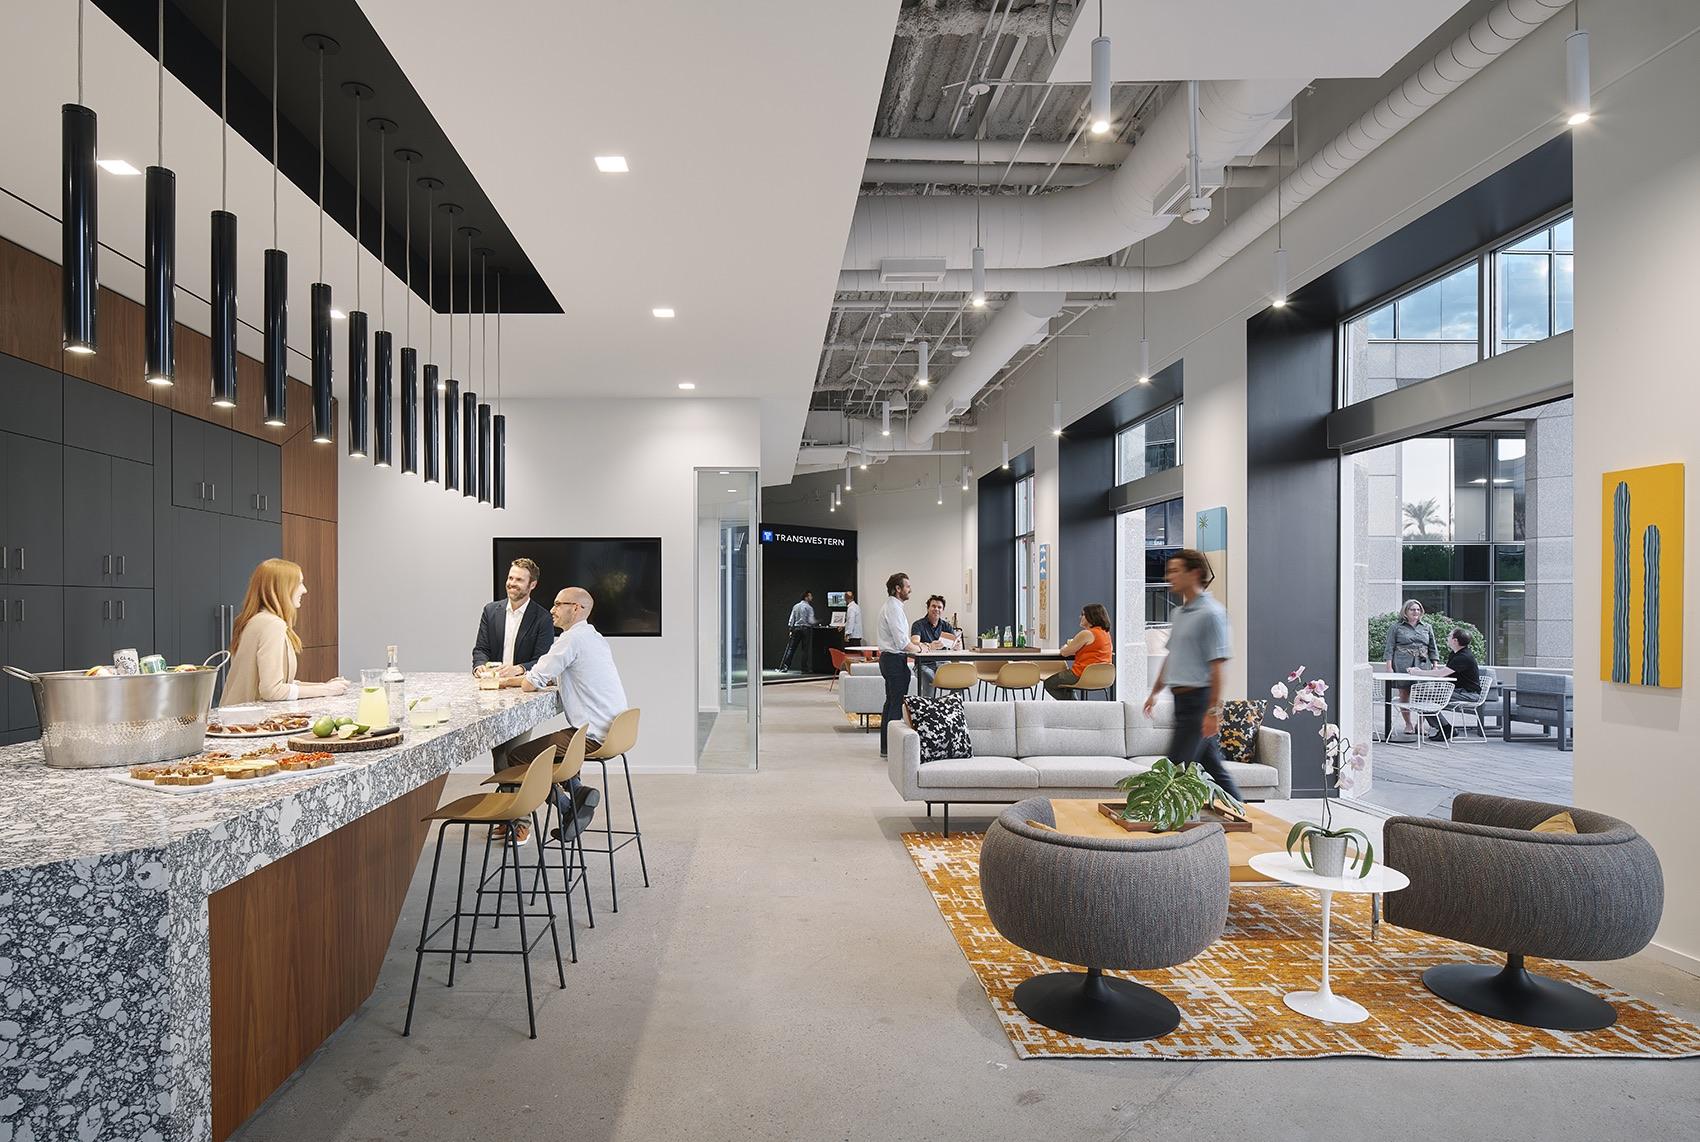 A Look Inside Transwestern's New Phoenix HQ